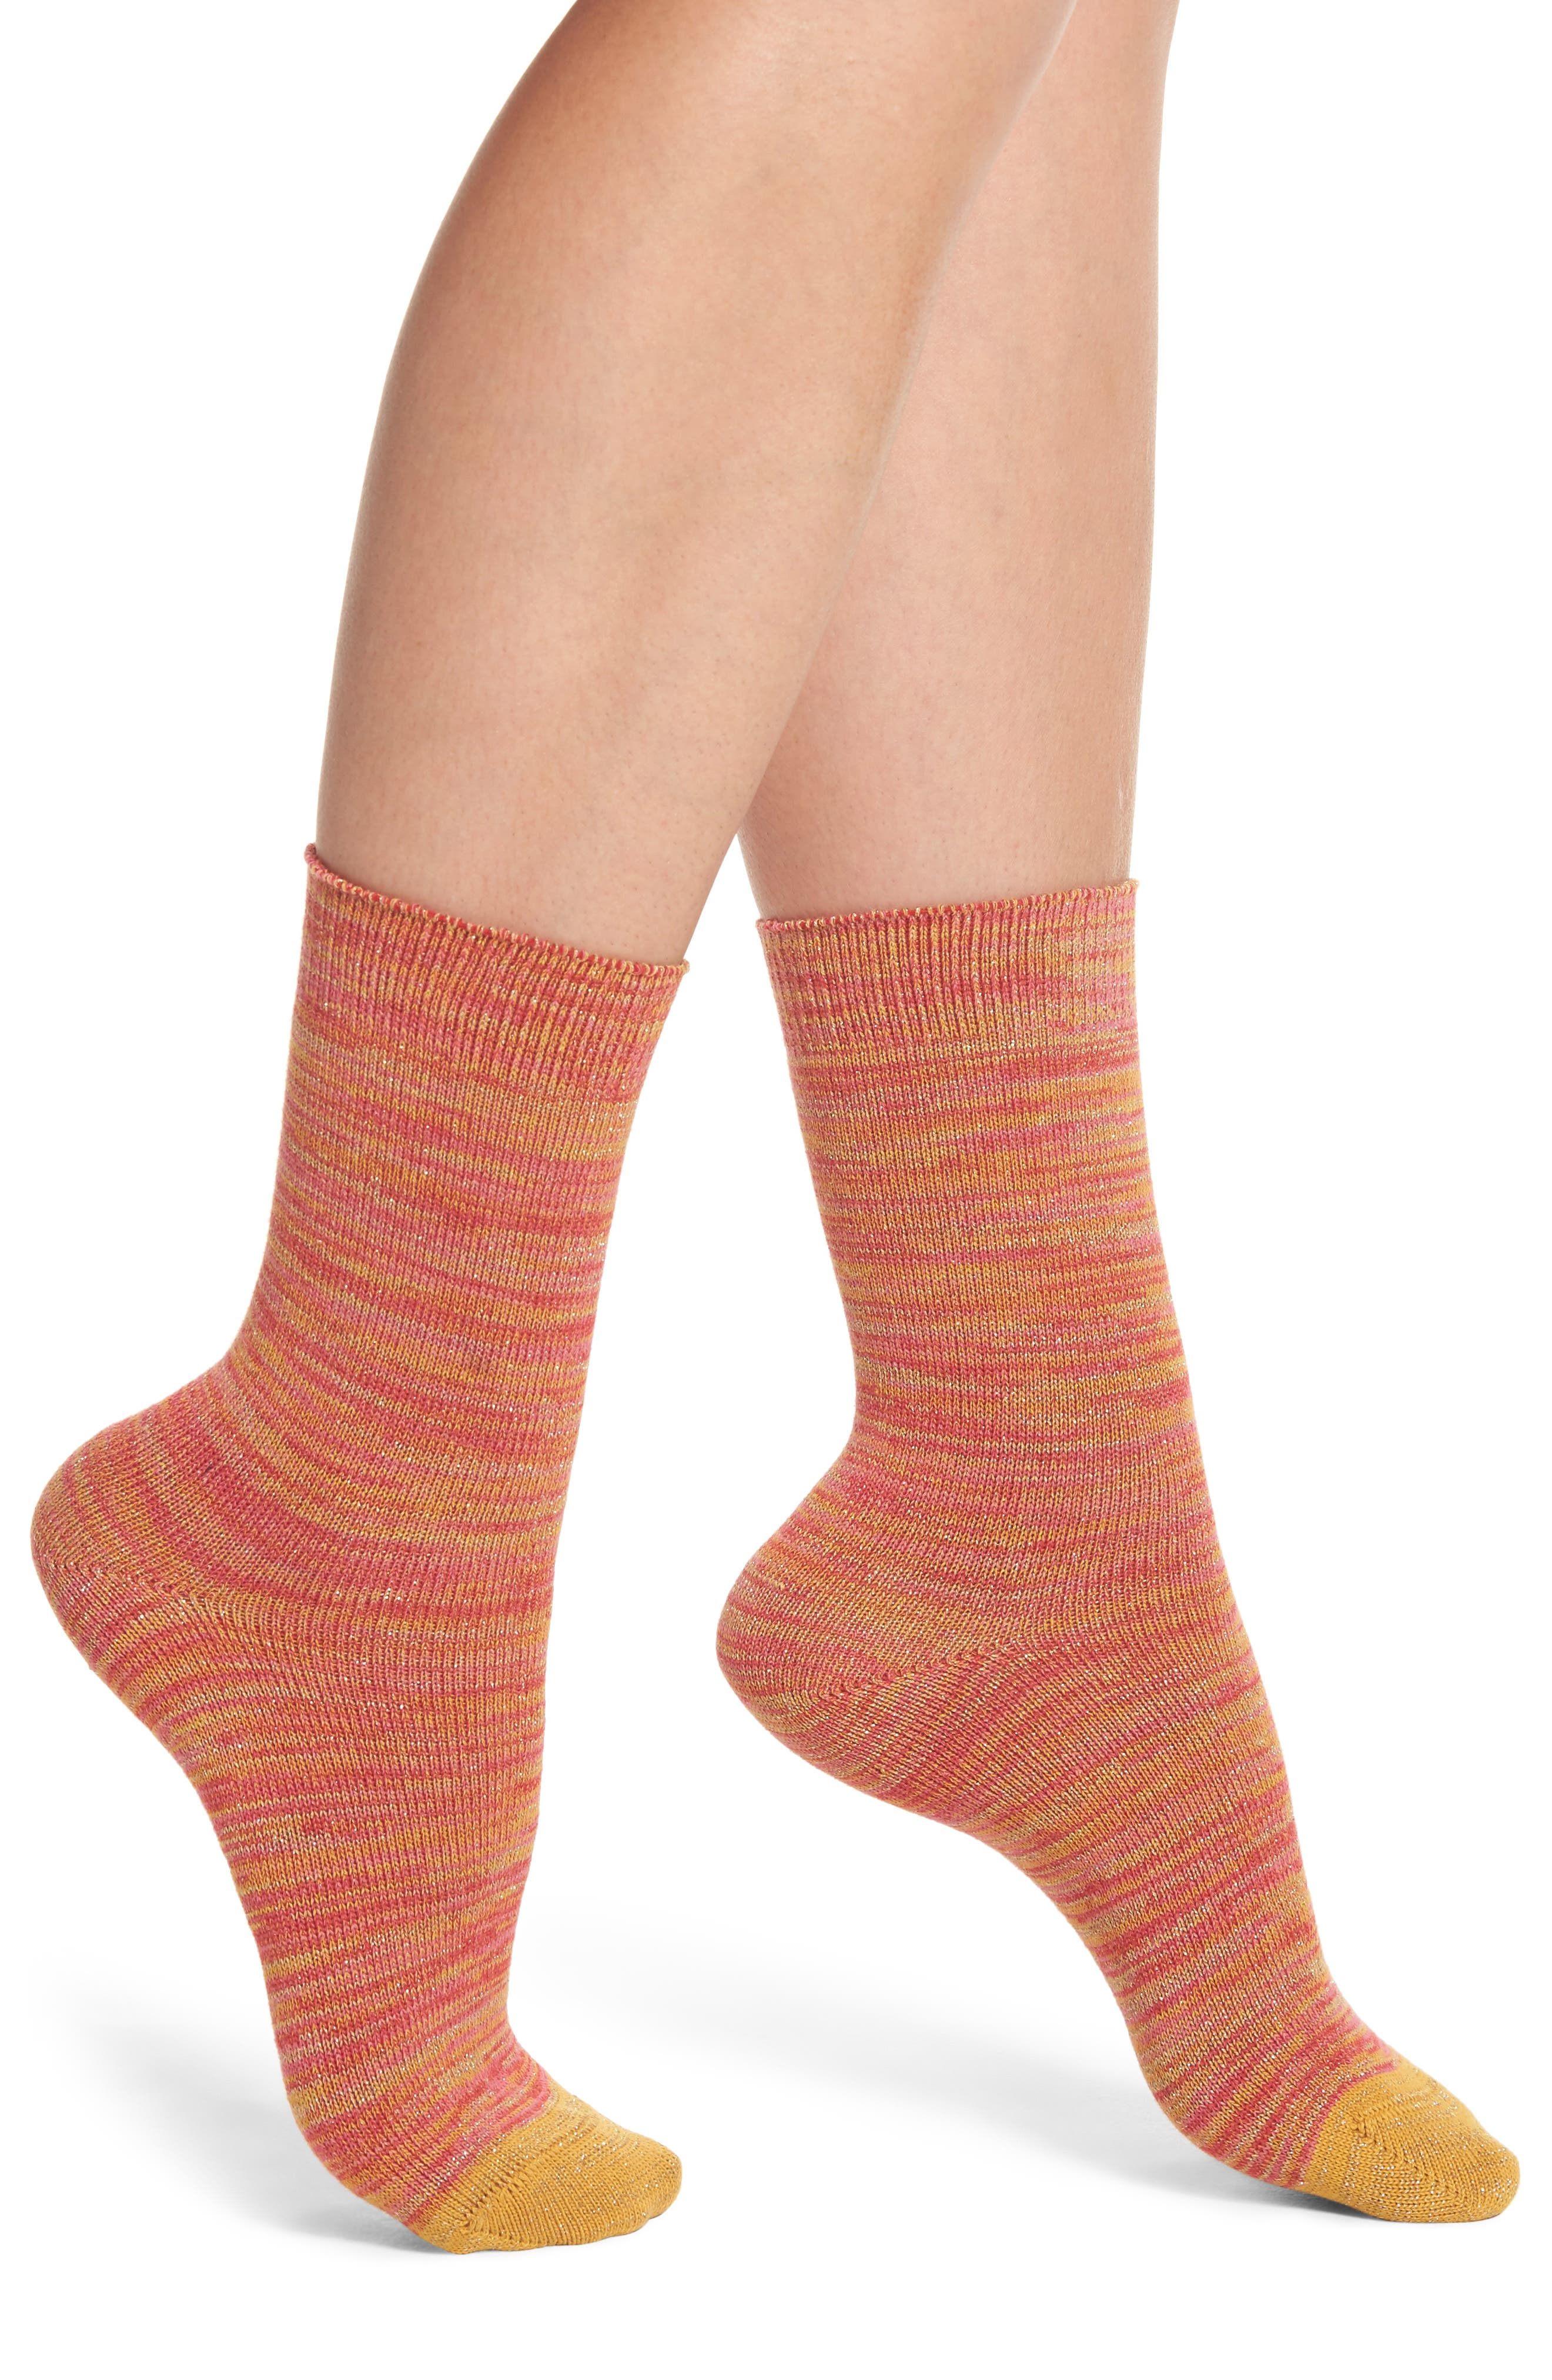 Emily Twinkletoes Crew Socks,                             Main thumbnail 1, color,                             Multi Coral